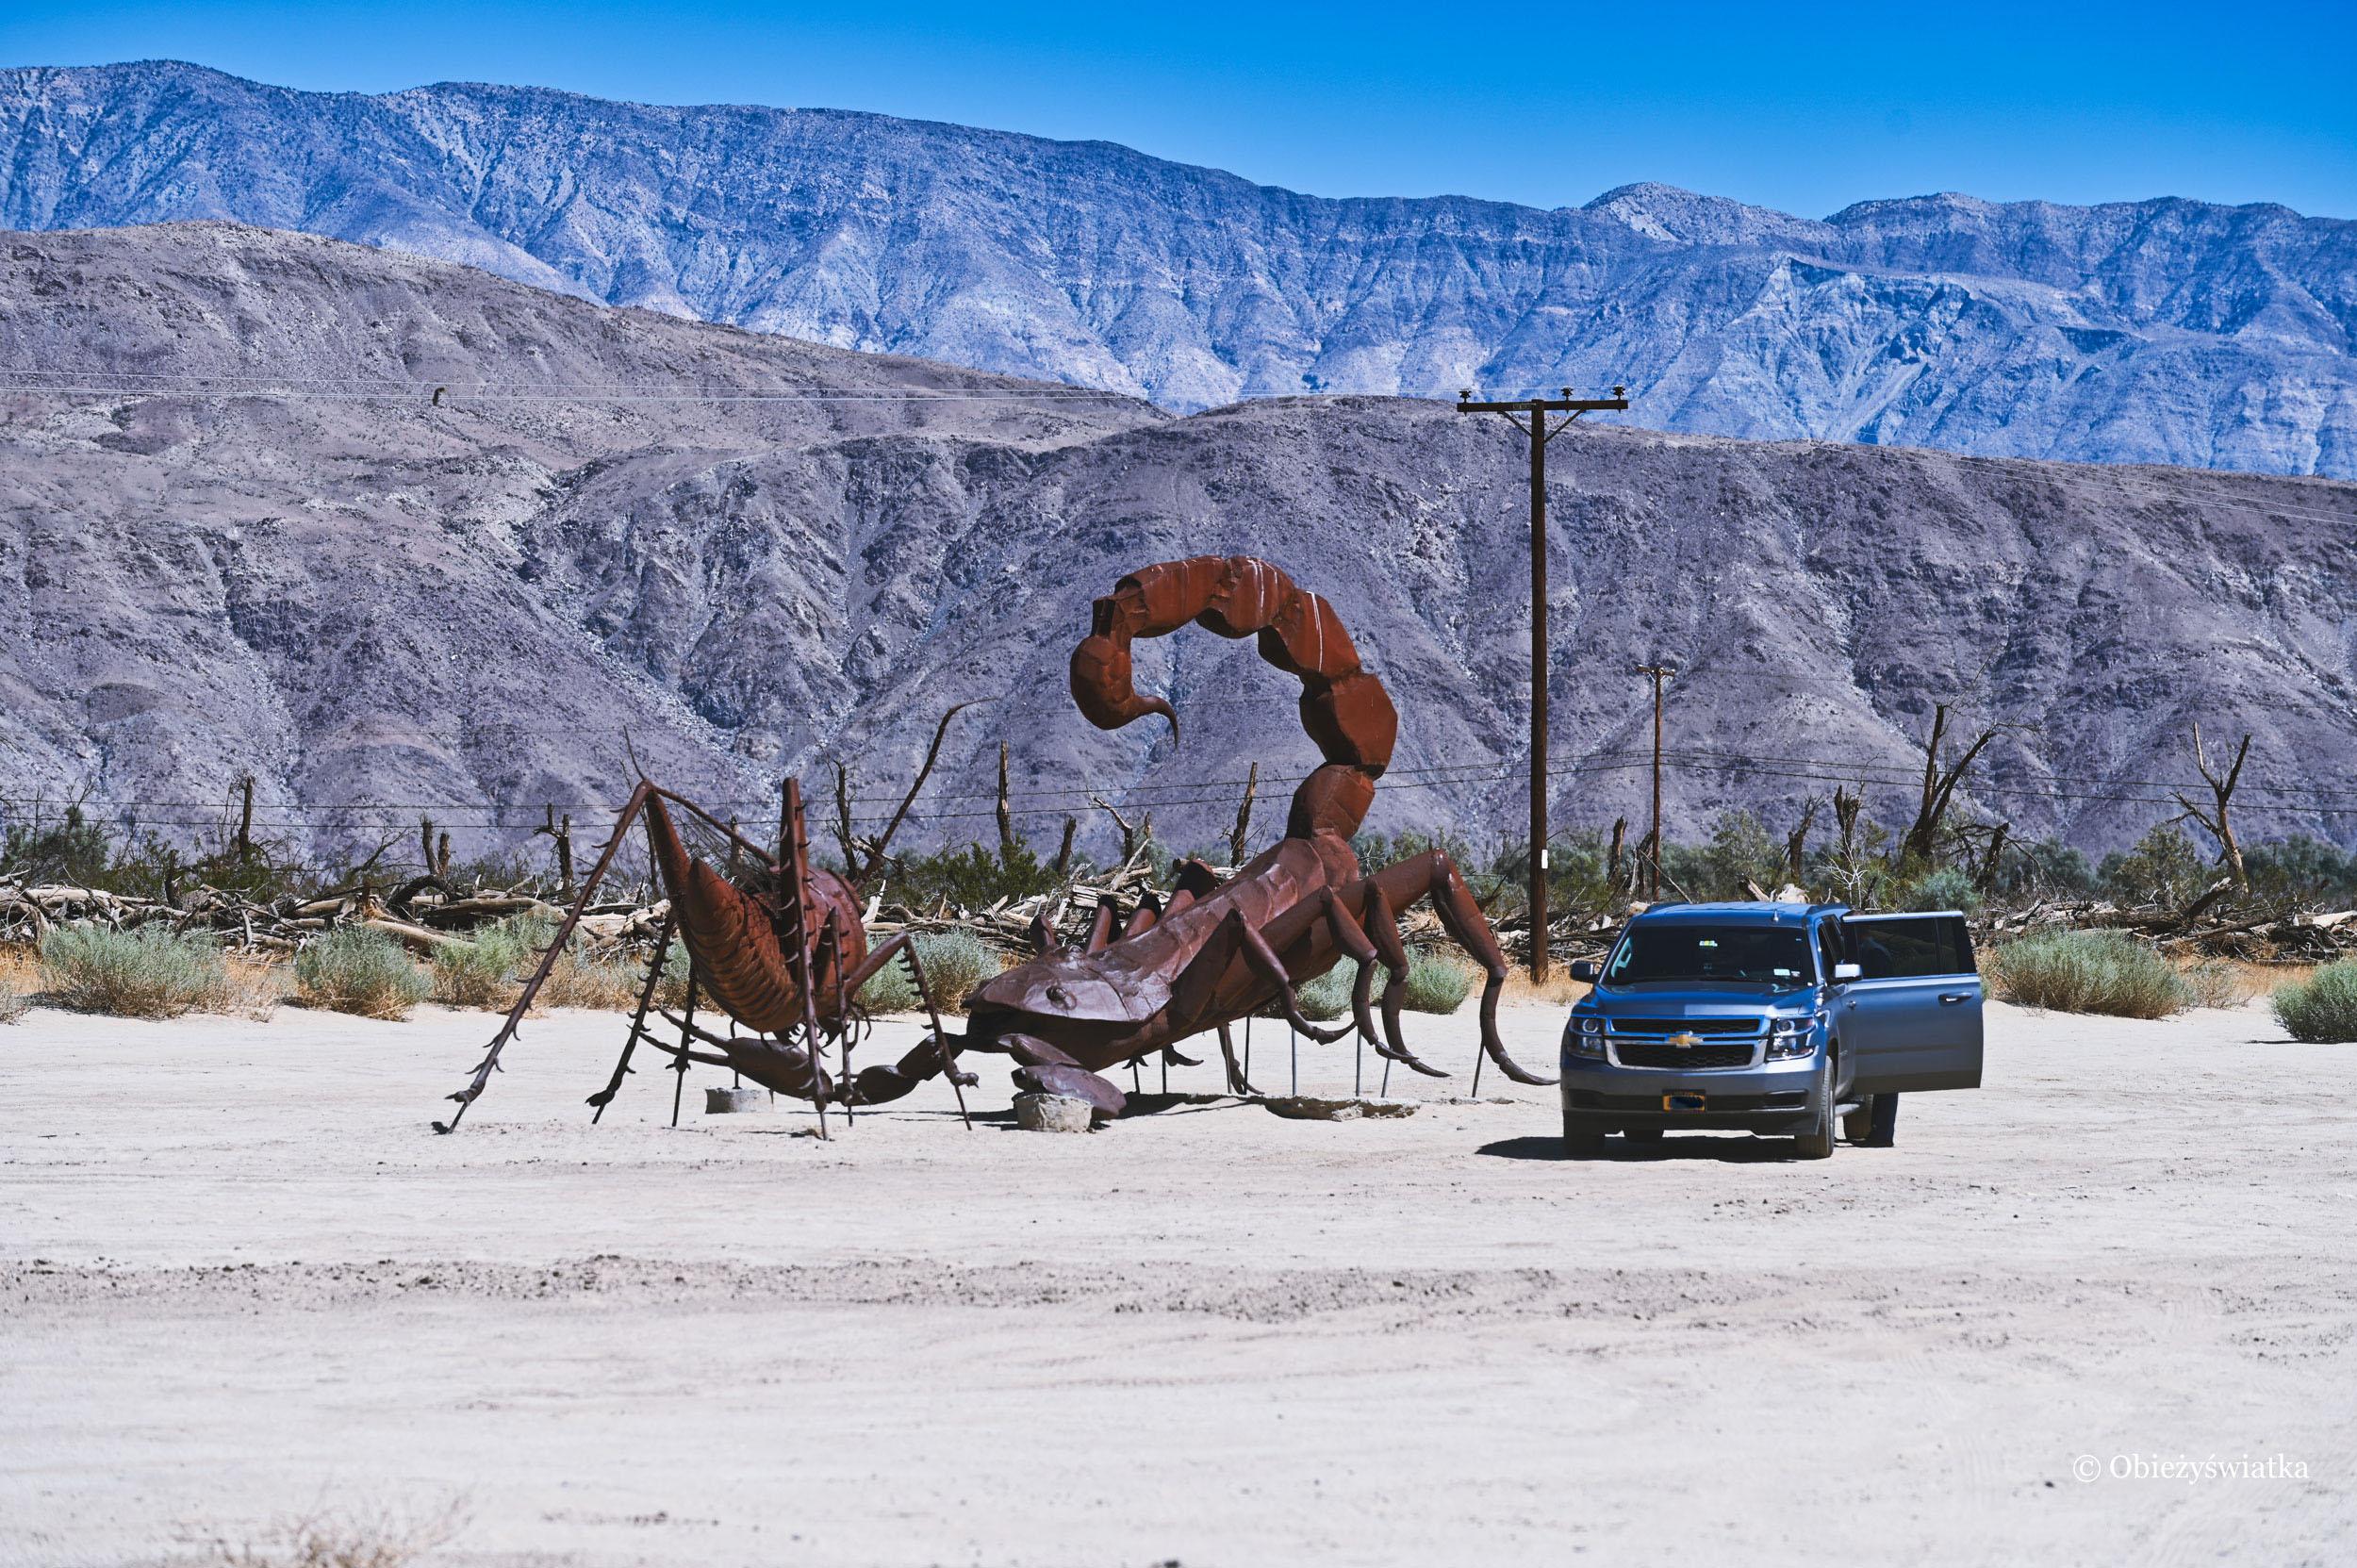 Ogromne rzeźby w Borrego Springs, USA